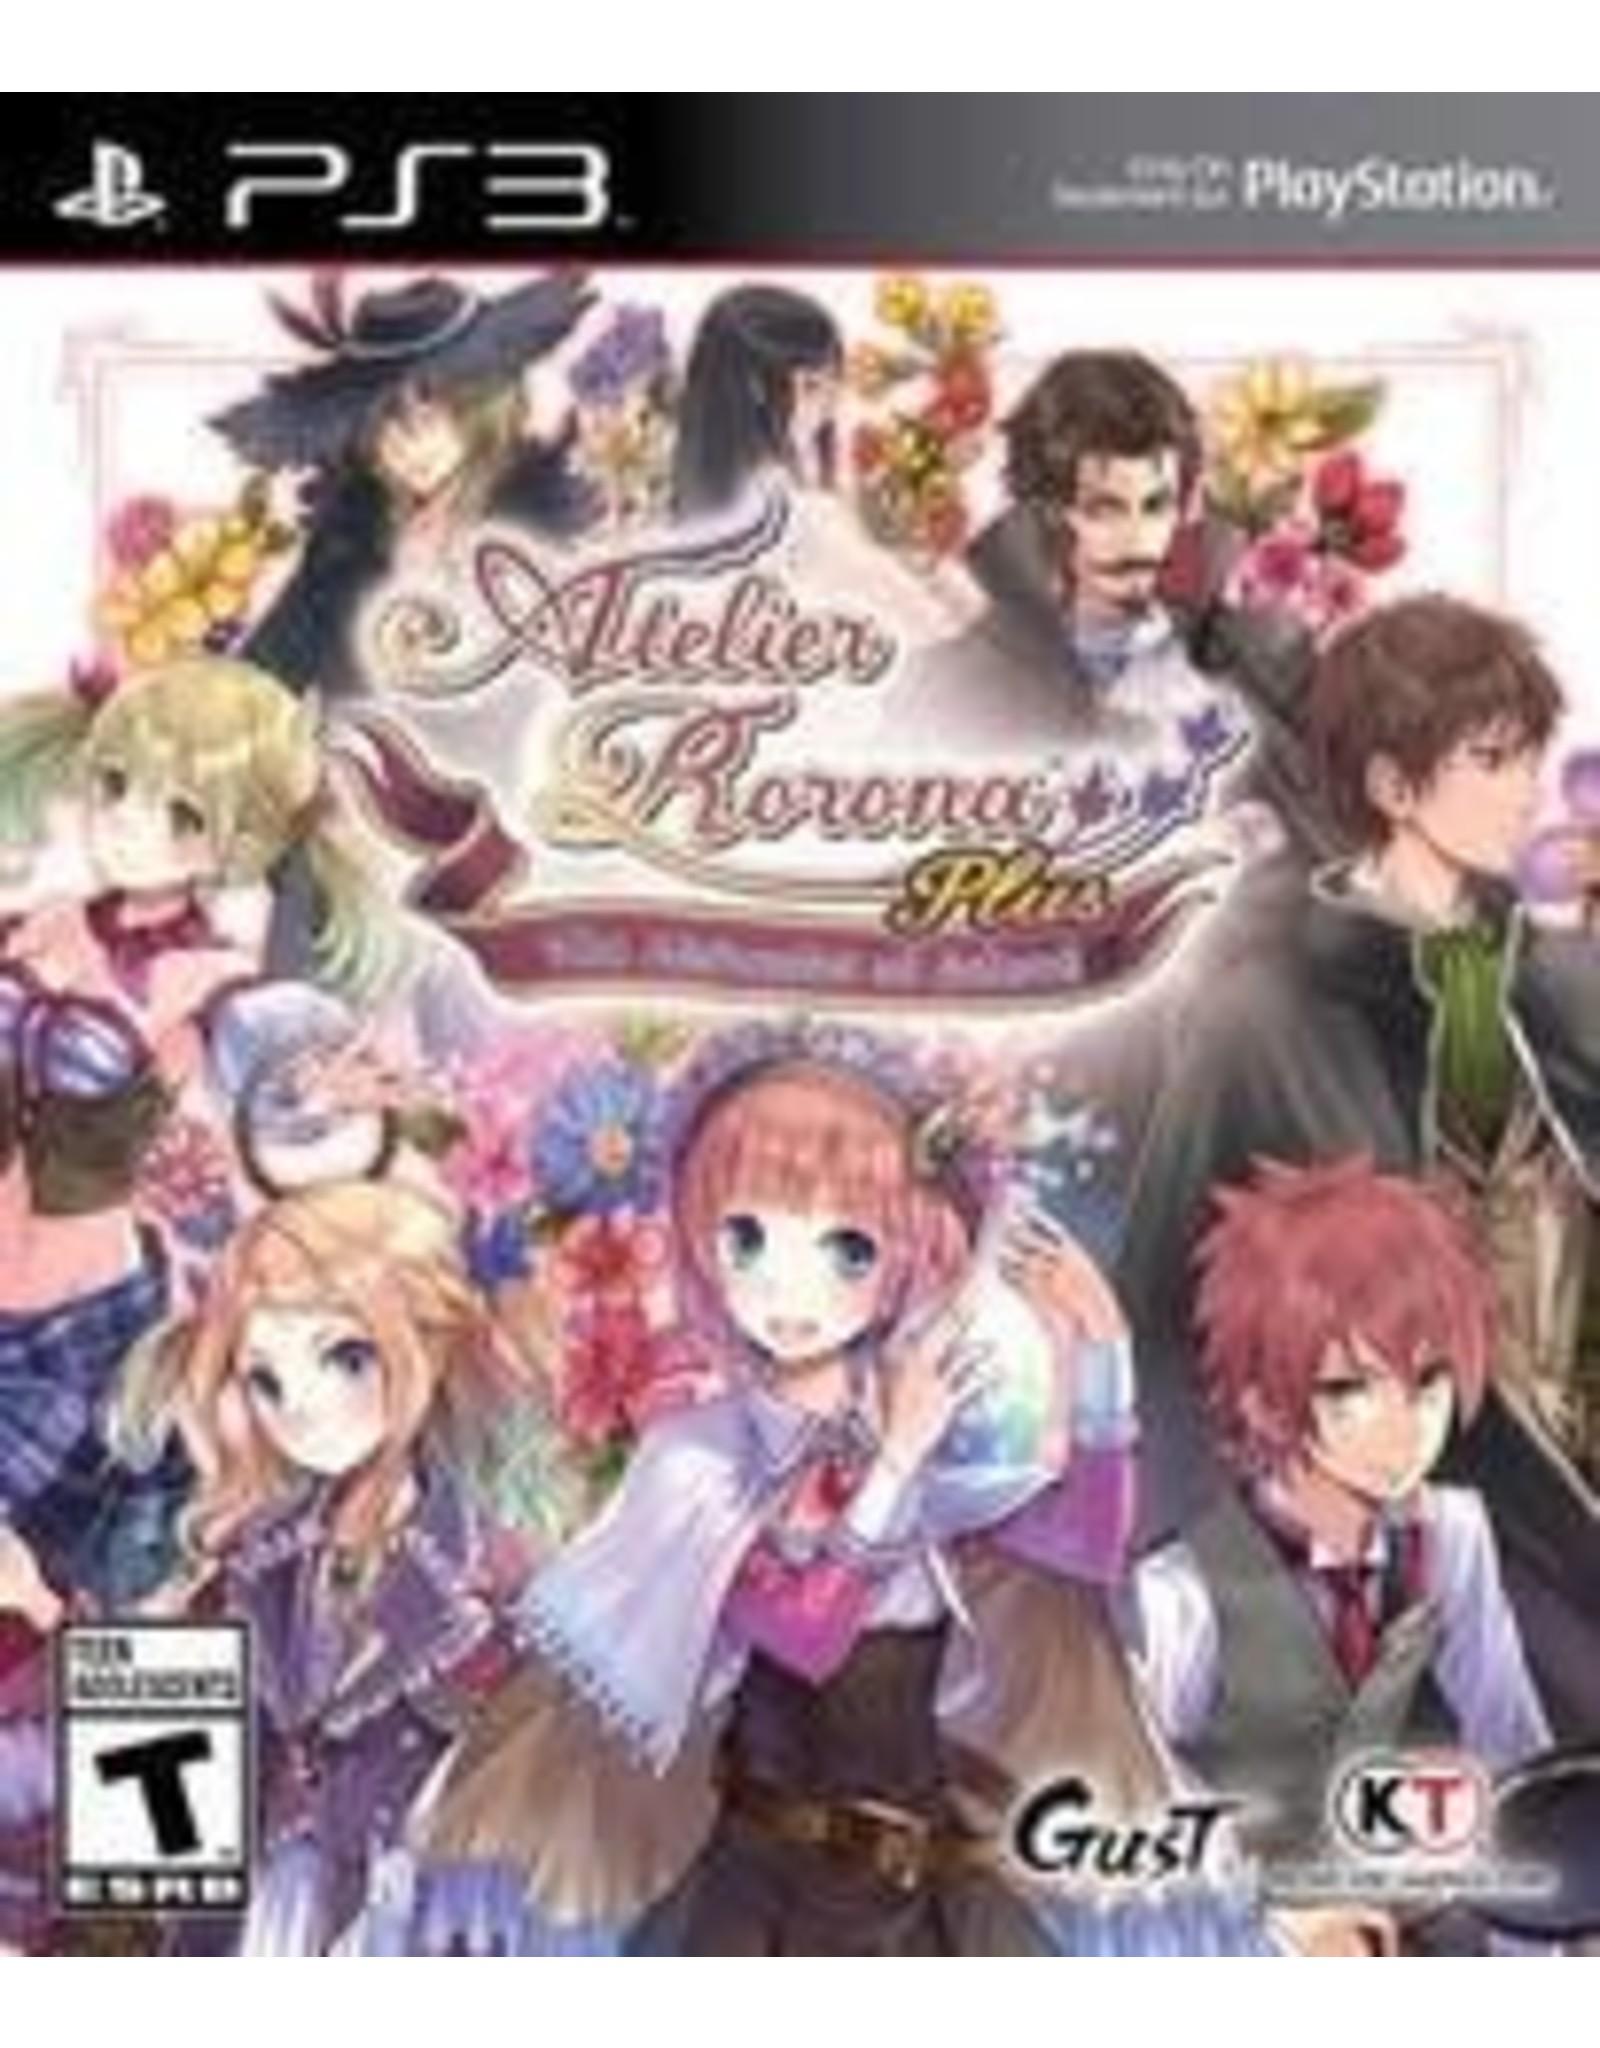 Playstation 3 Atelier Rorona Plus: The Alchemist of Arland (CiB)